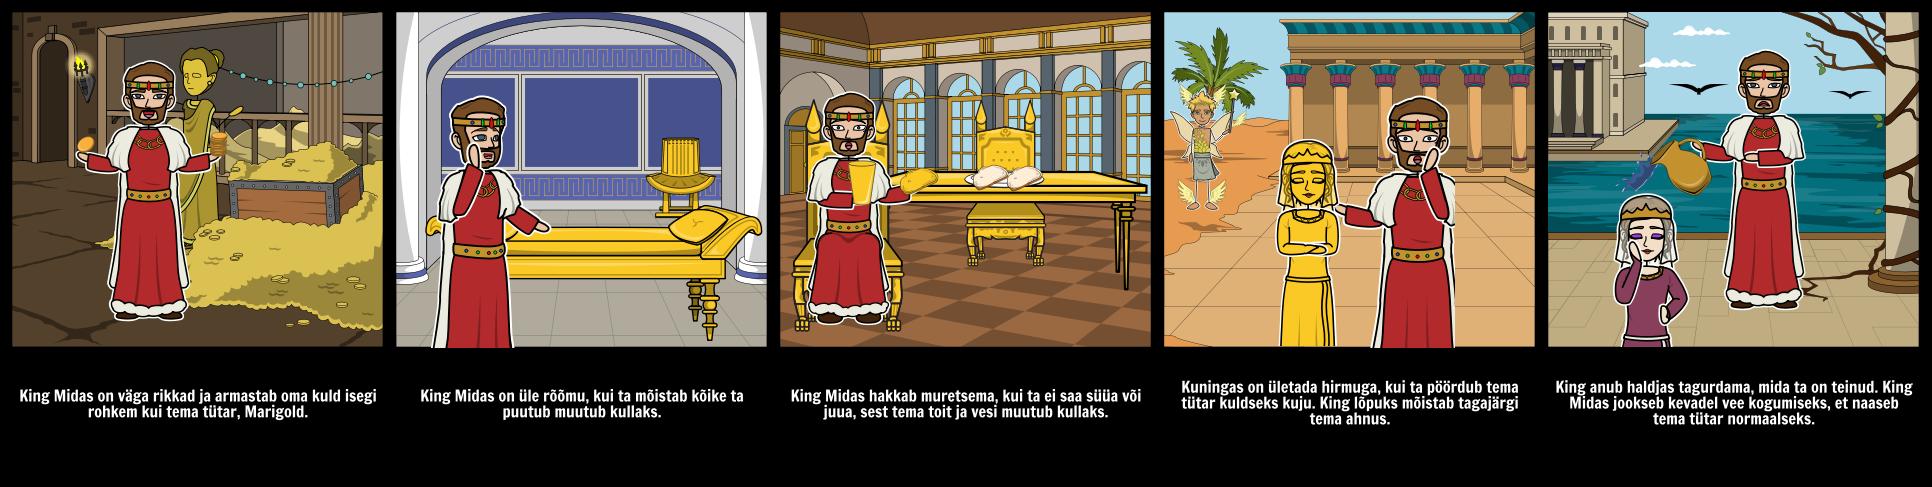 "King Midas ""Golden Touch Character Analüüs"